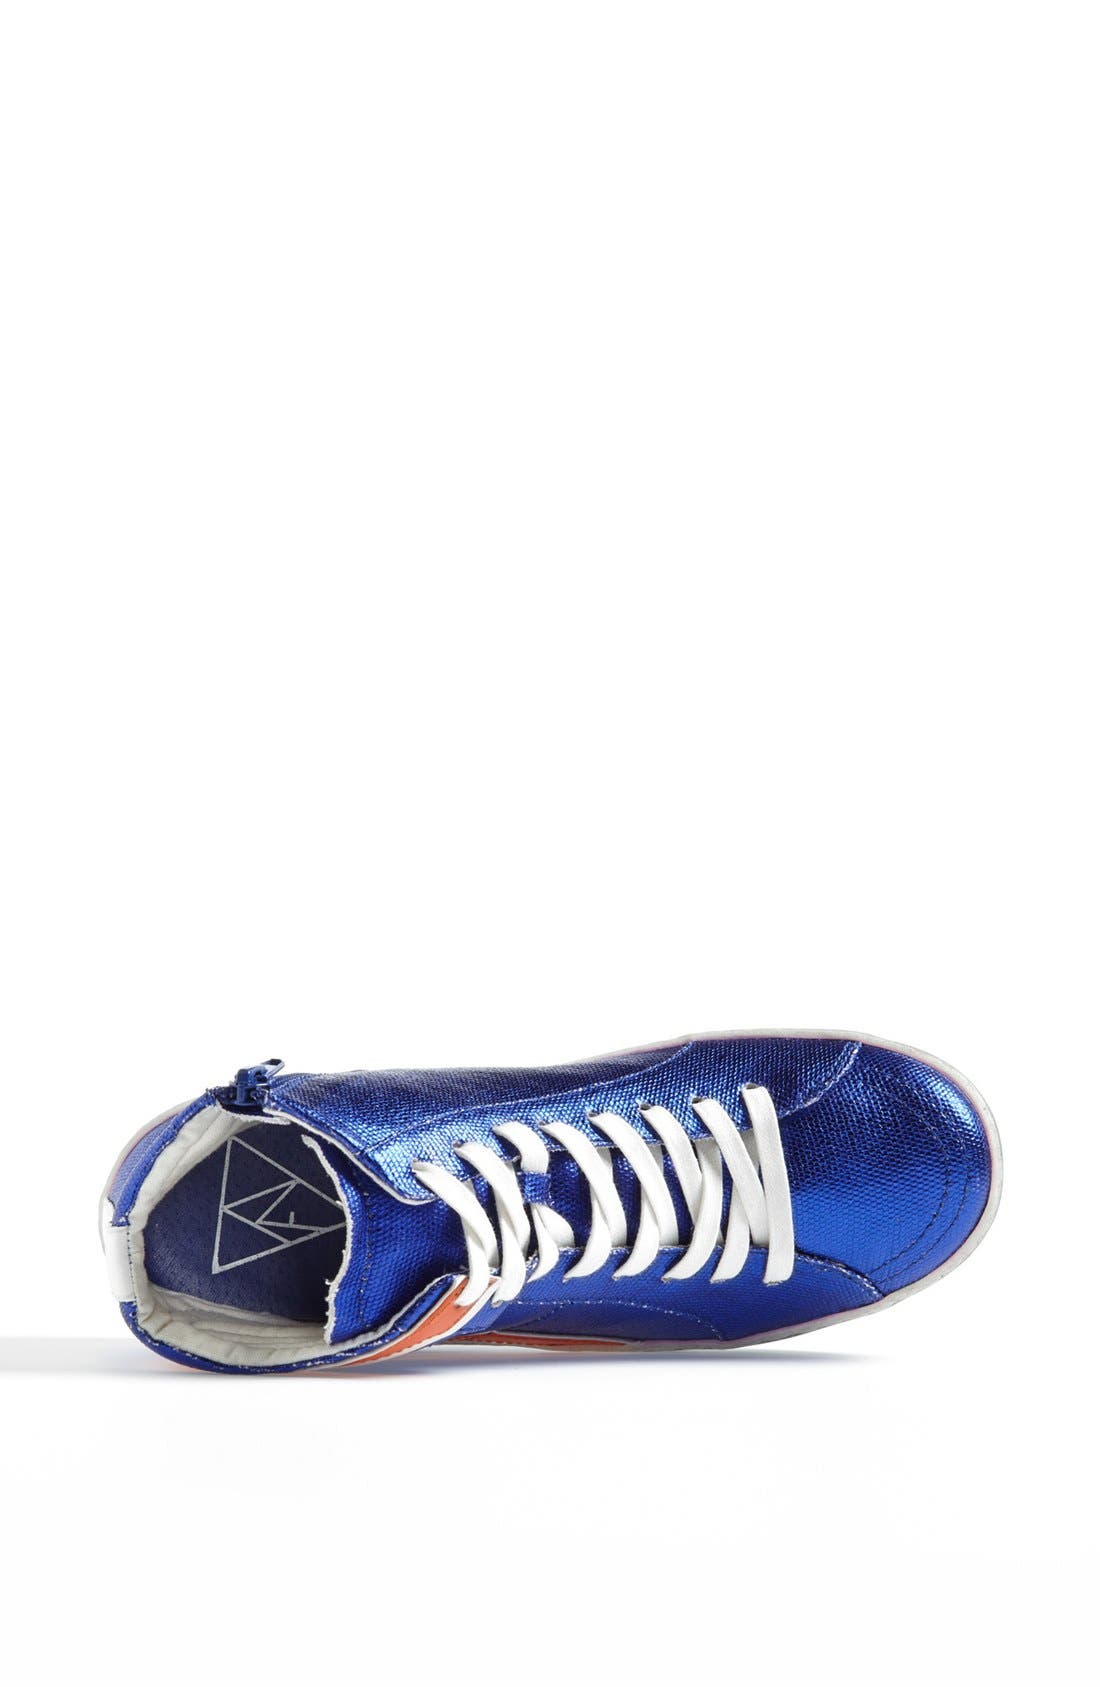 Alternate Image 3  - Matisse 'Ascot Friday - Alva' Sneaker